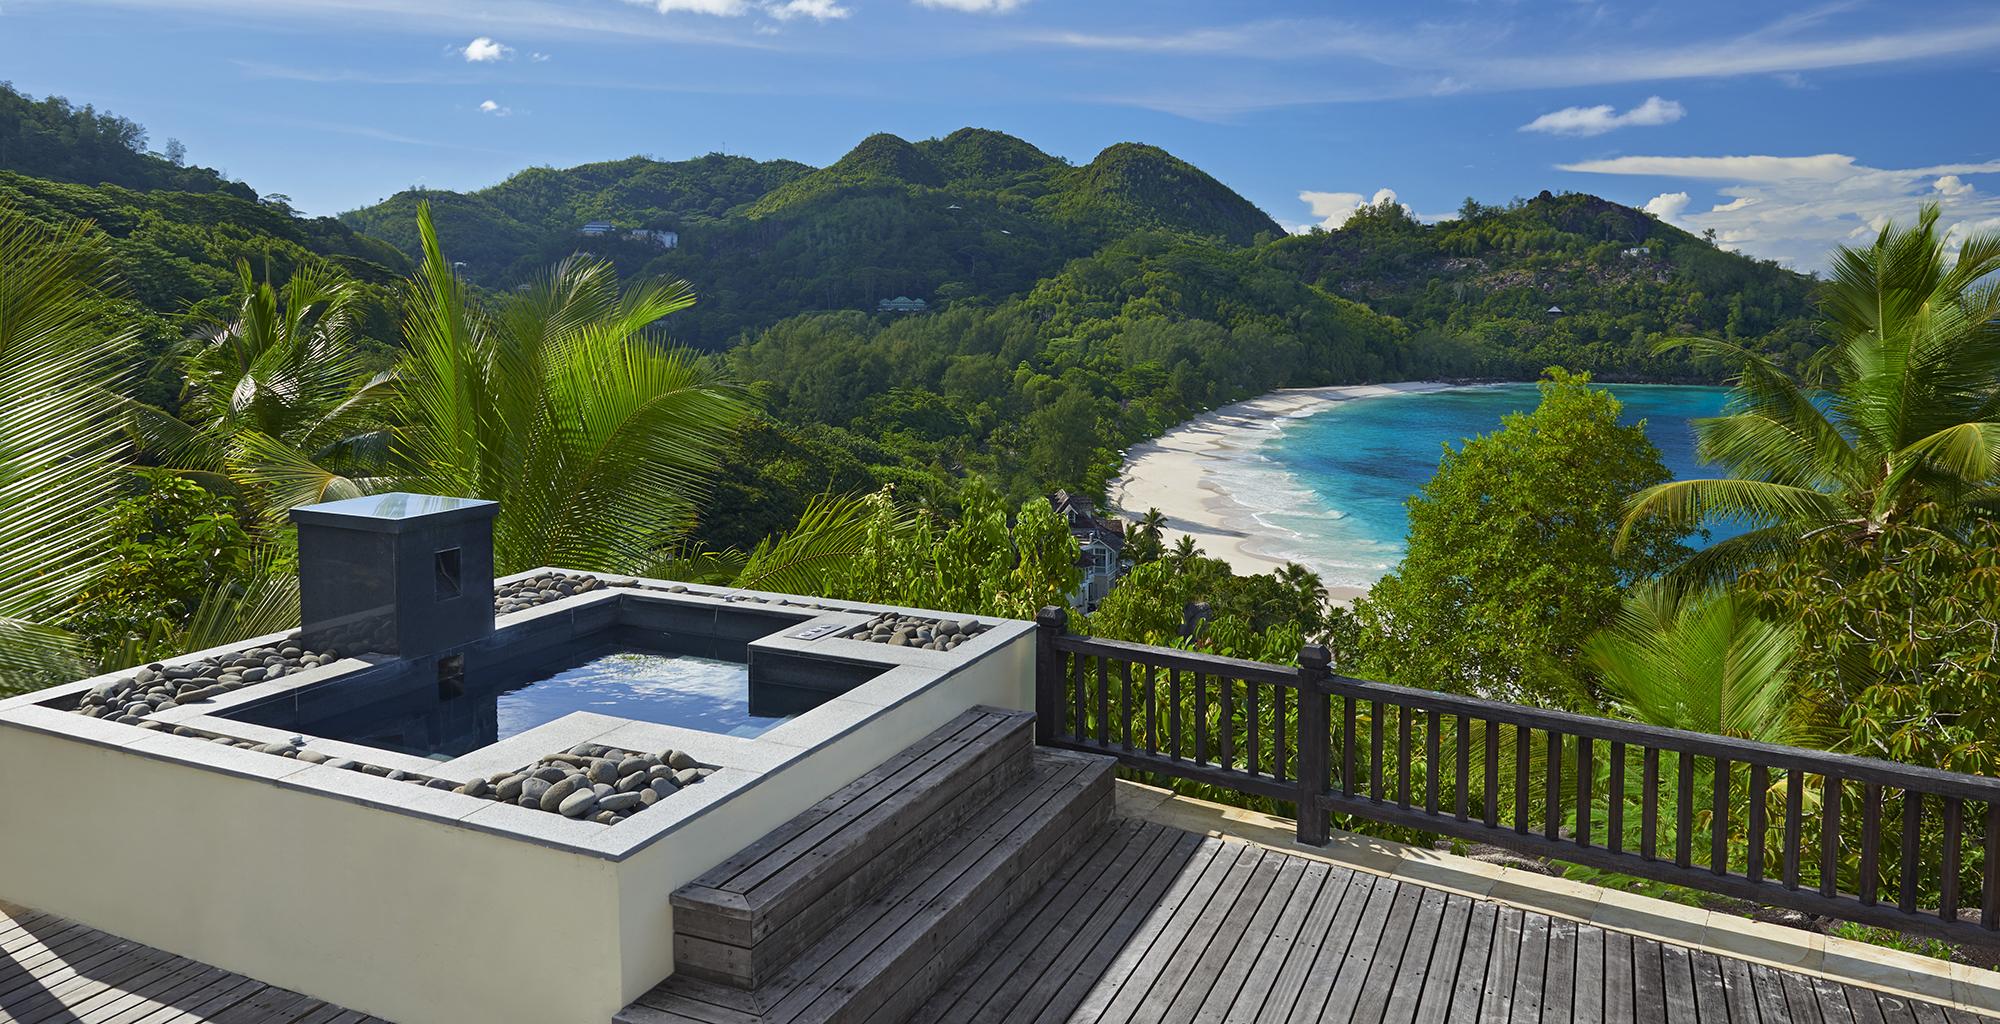 Seychelles-Banyan-Tree-Hotel-View